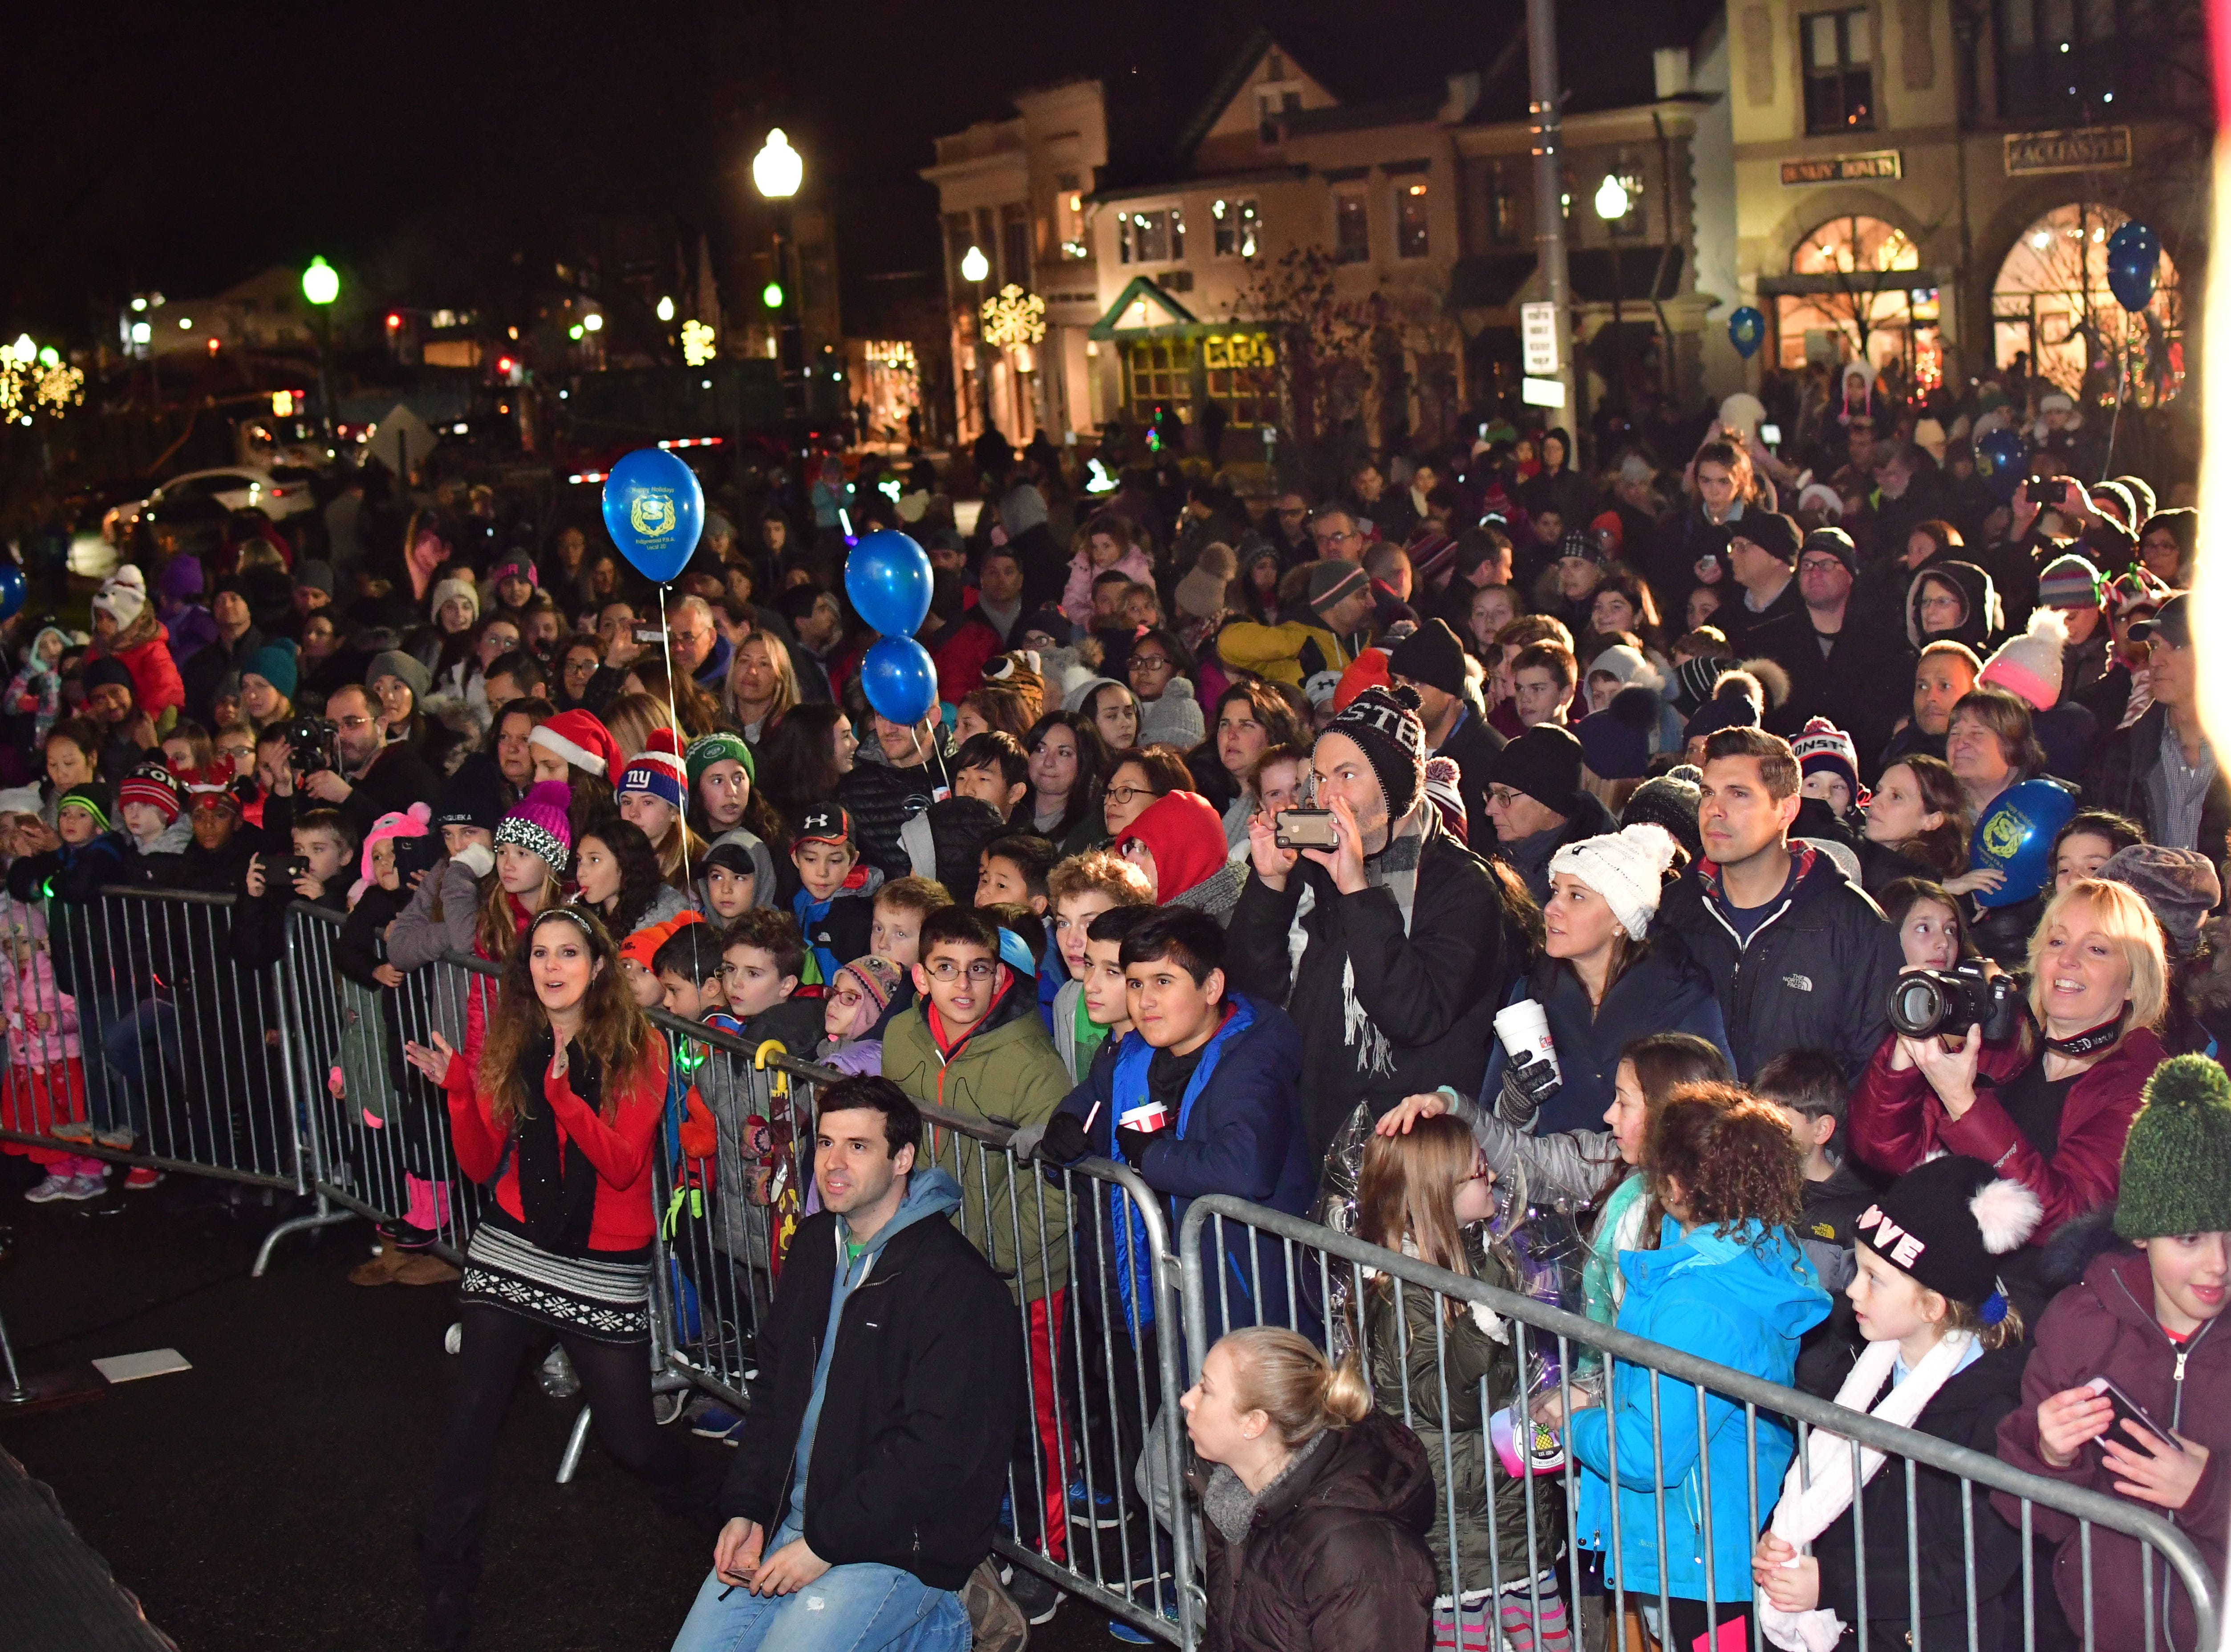 The crowd along East Ridgewood Avenue in Ridgewood on Nov. 30.